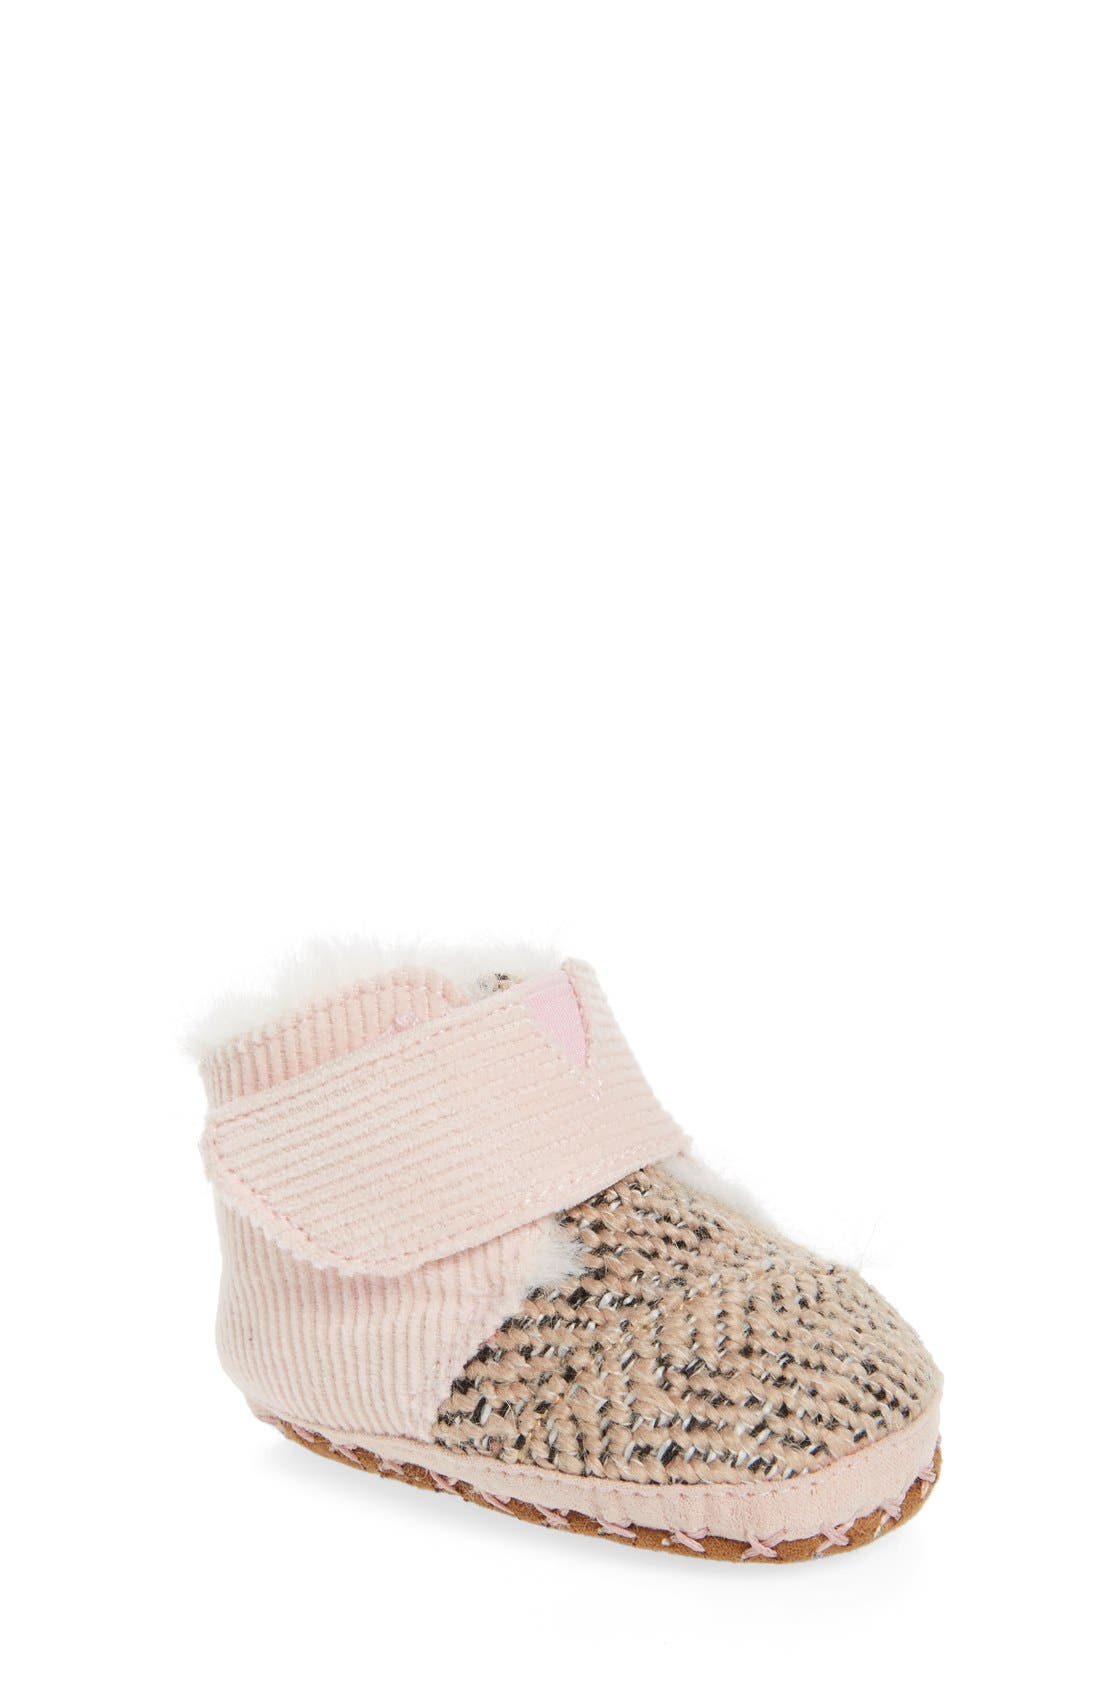 Cuna Crib Shoe,                         Main,                         color, 650